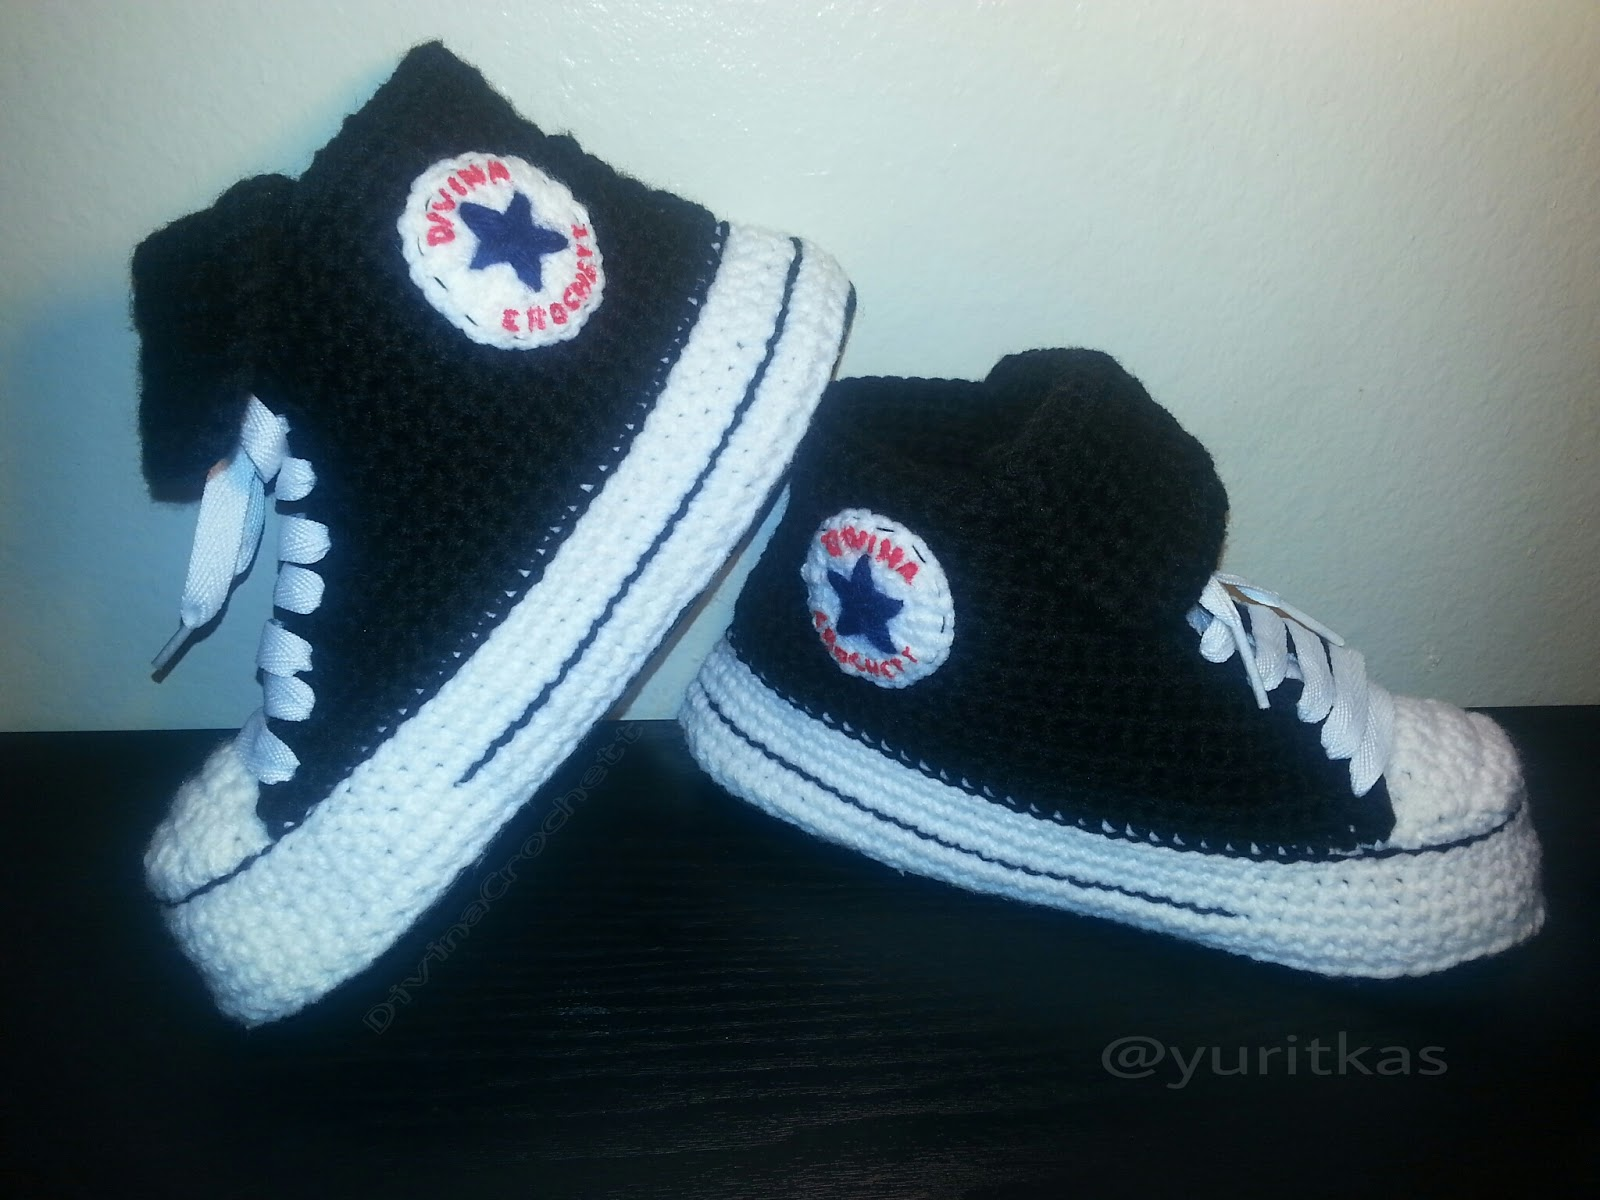 Asombroso Patrón De Crochet Zapato Converse Imágenes - Ideas de ...